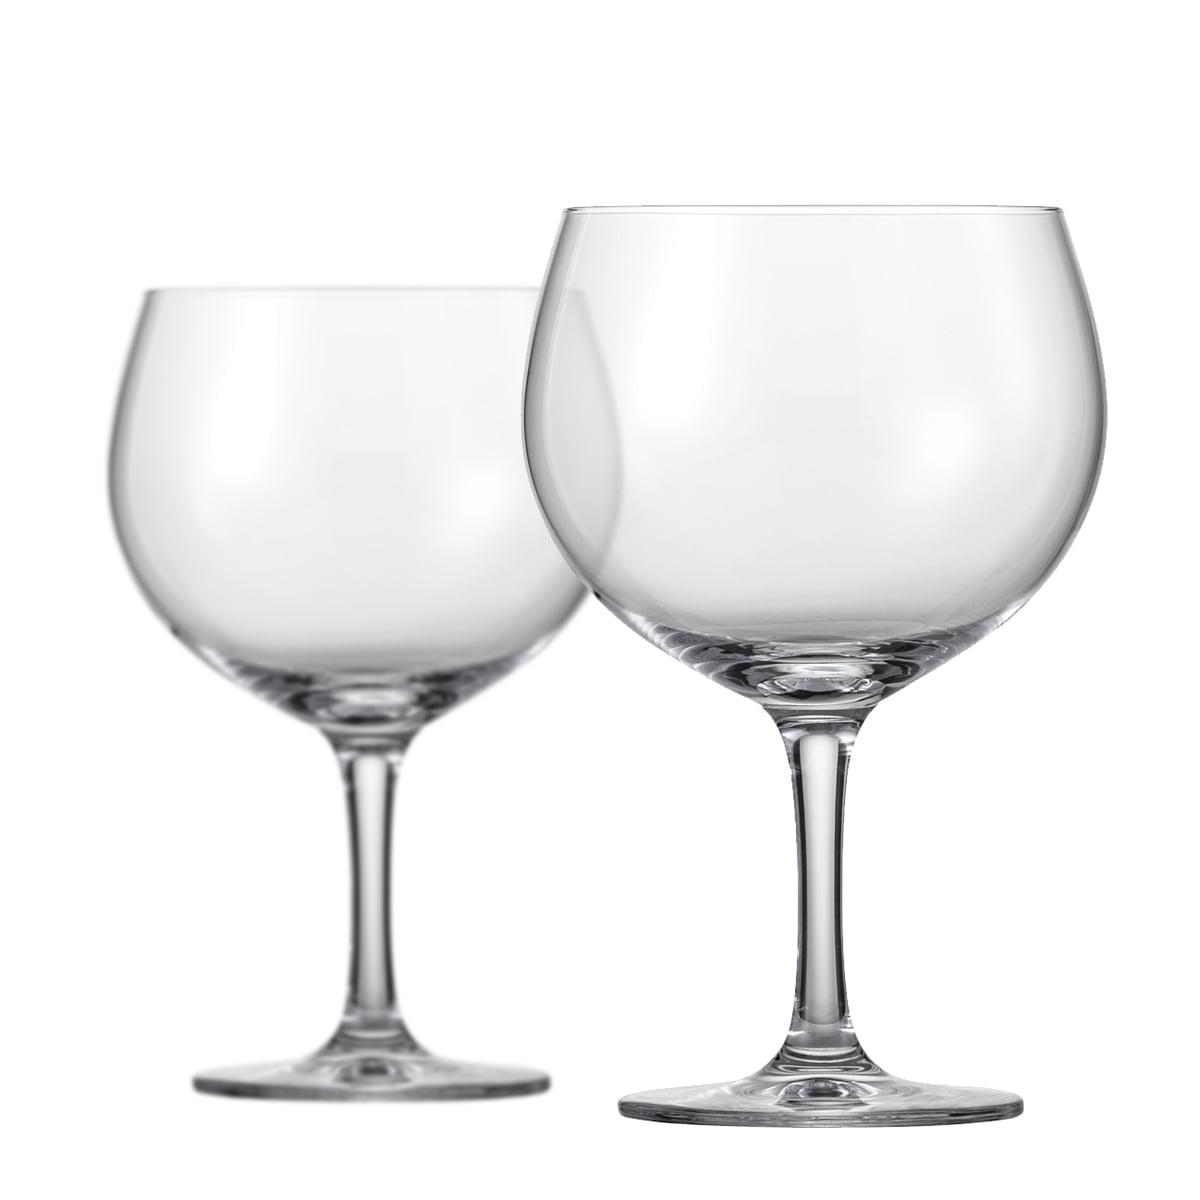 gin tonic glasses offer set of 2 by schott zwiesel